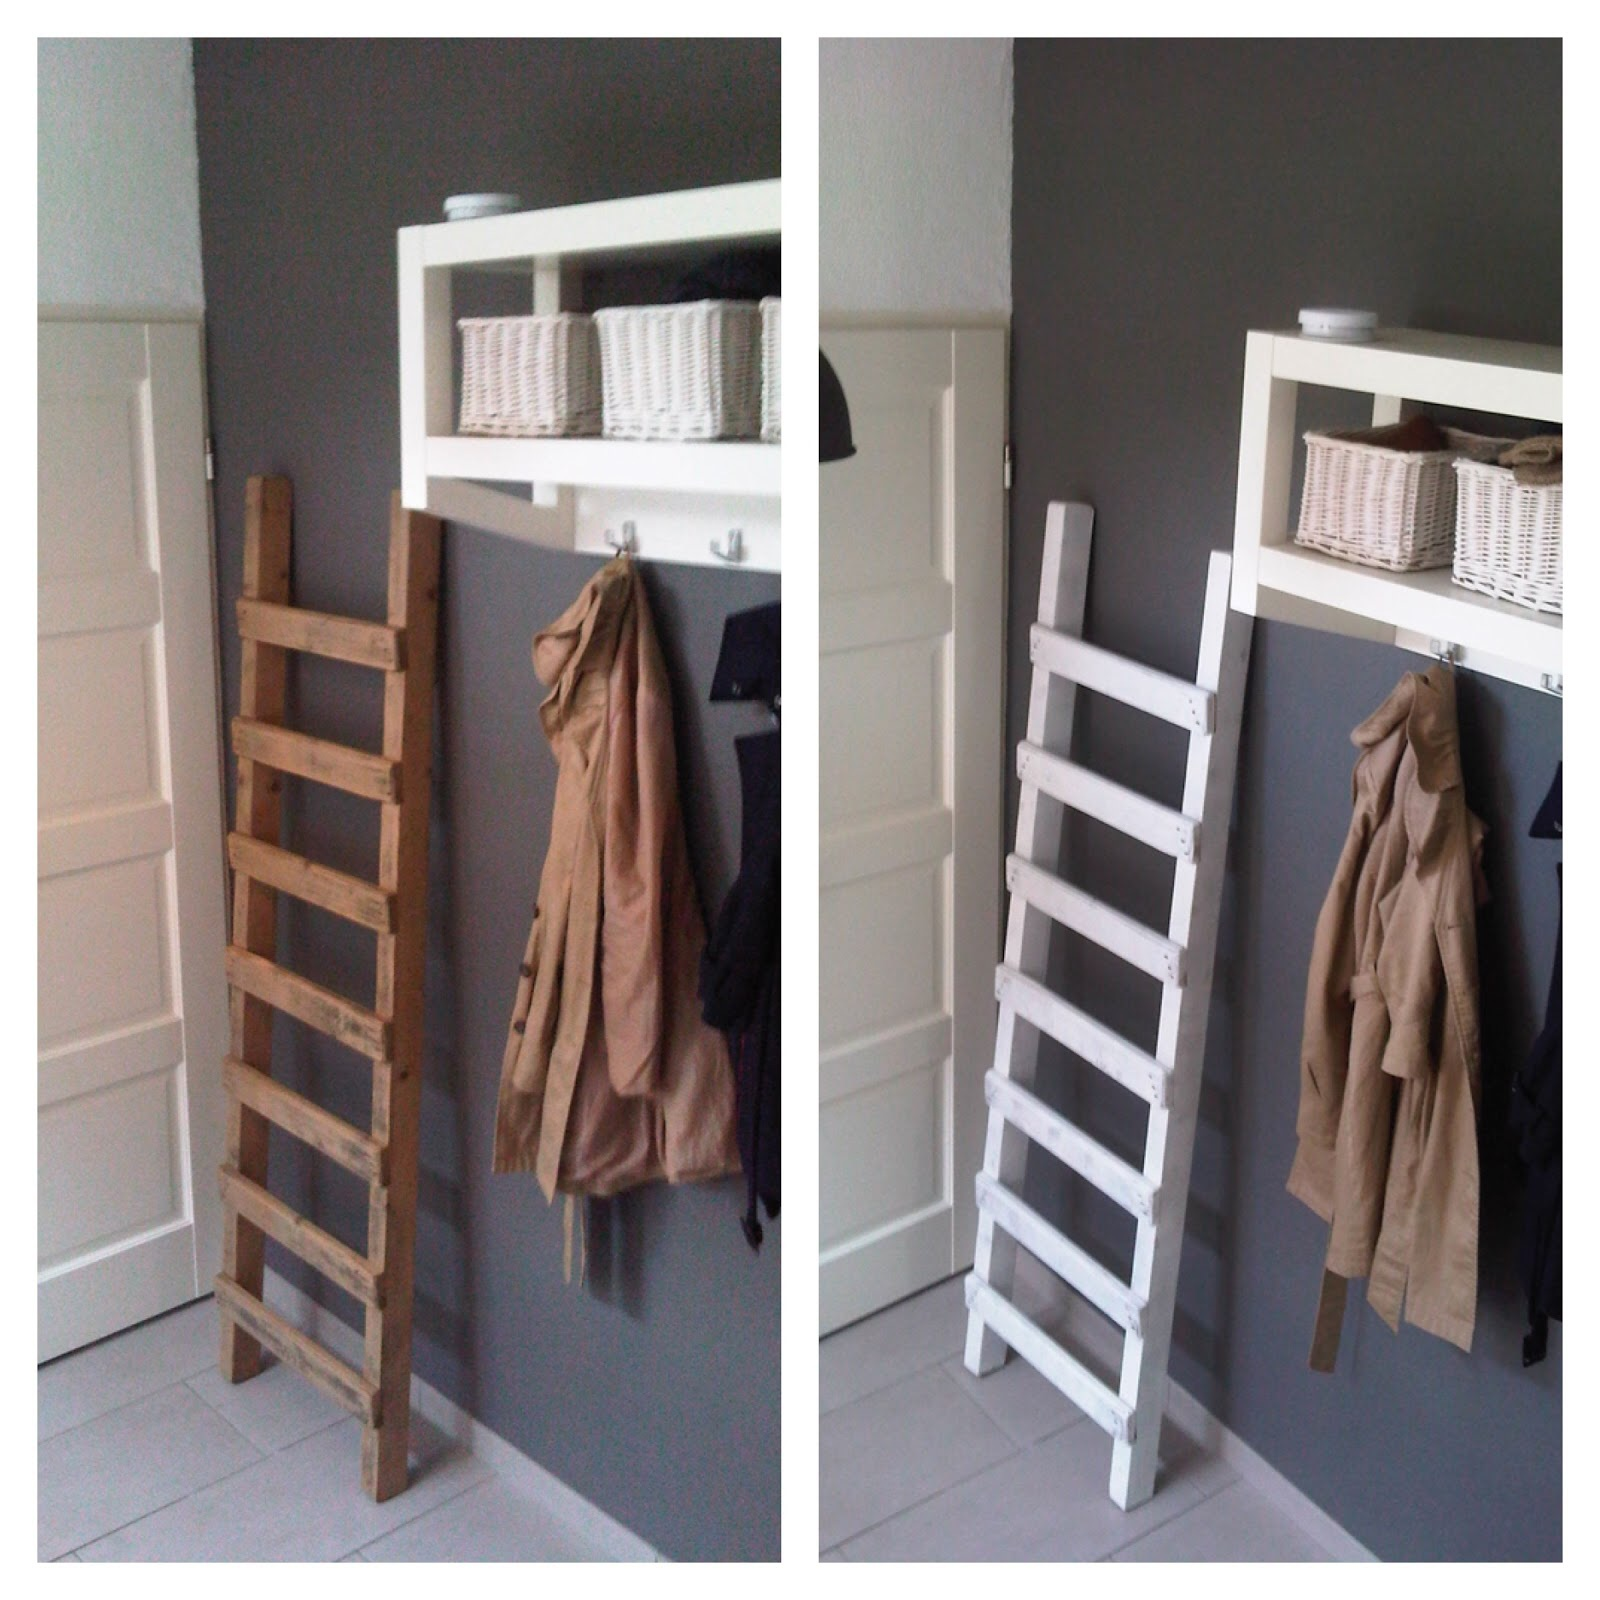 20170312 054807 badkamer kast handdoeken - Sanitair opknappen ...